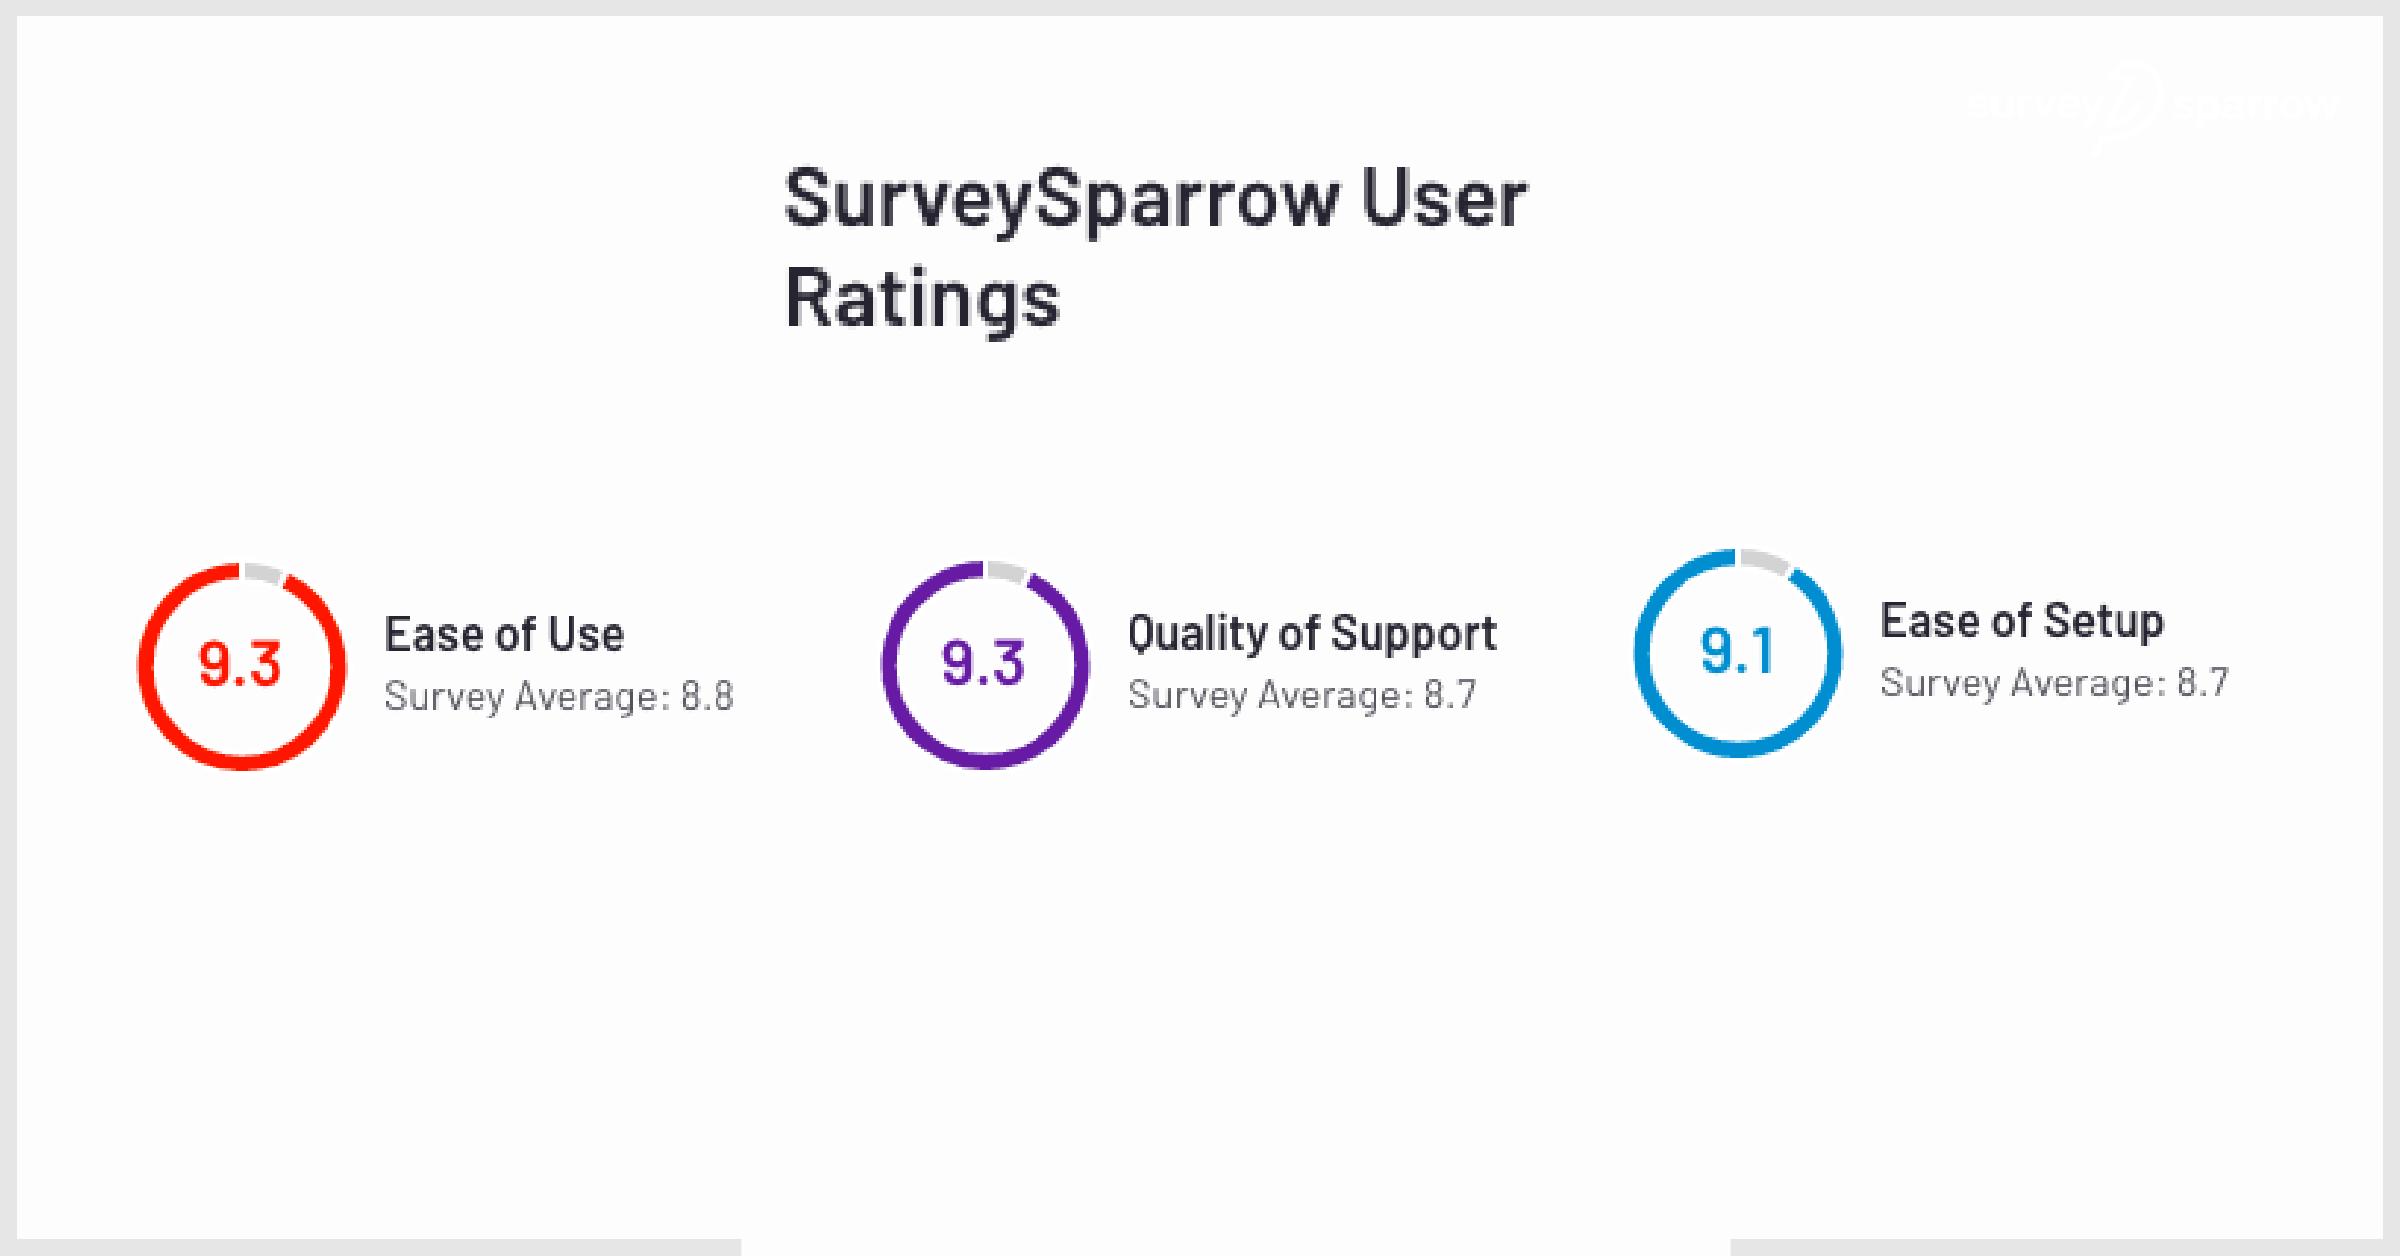 SurveySparrow User Rating - G2 Crowd.